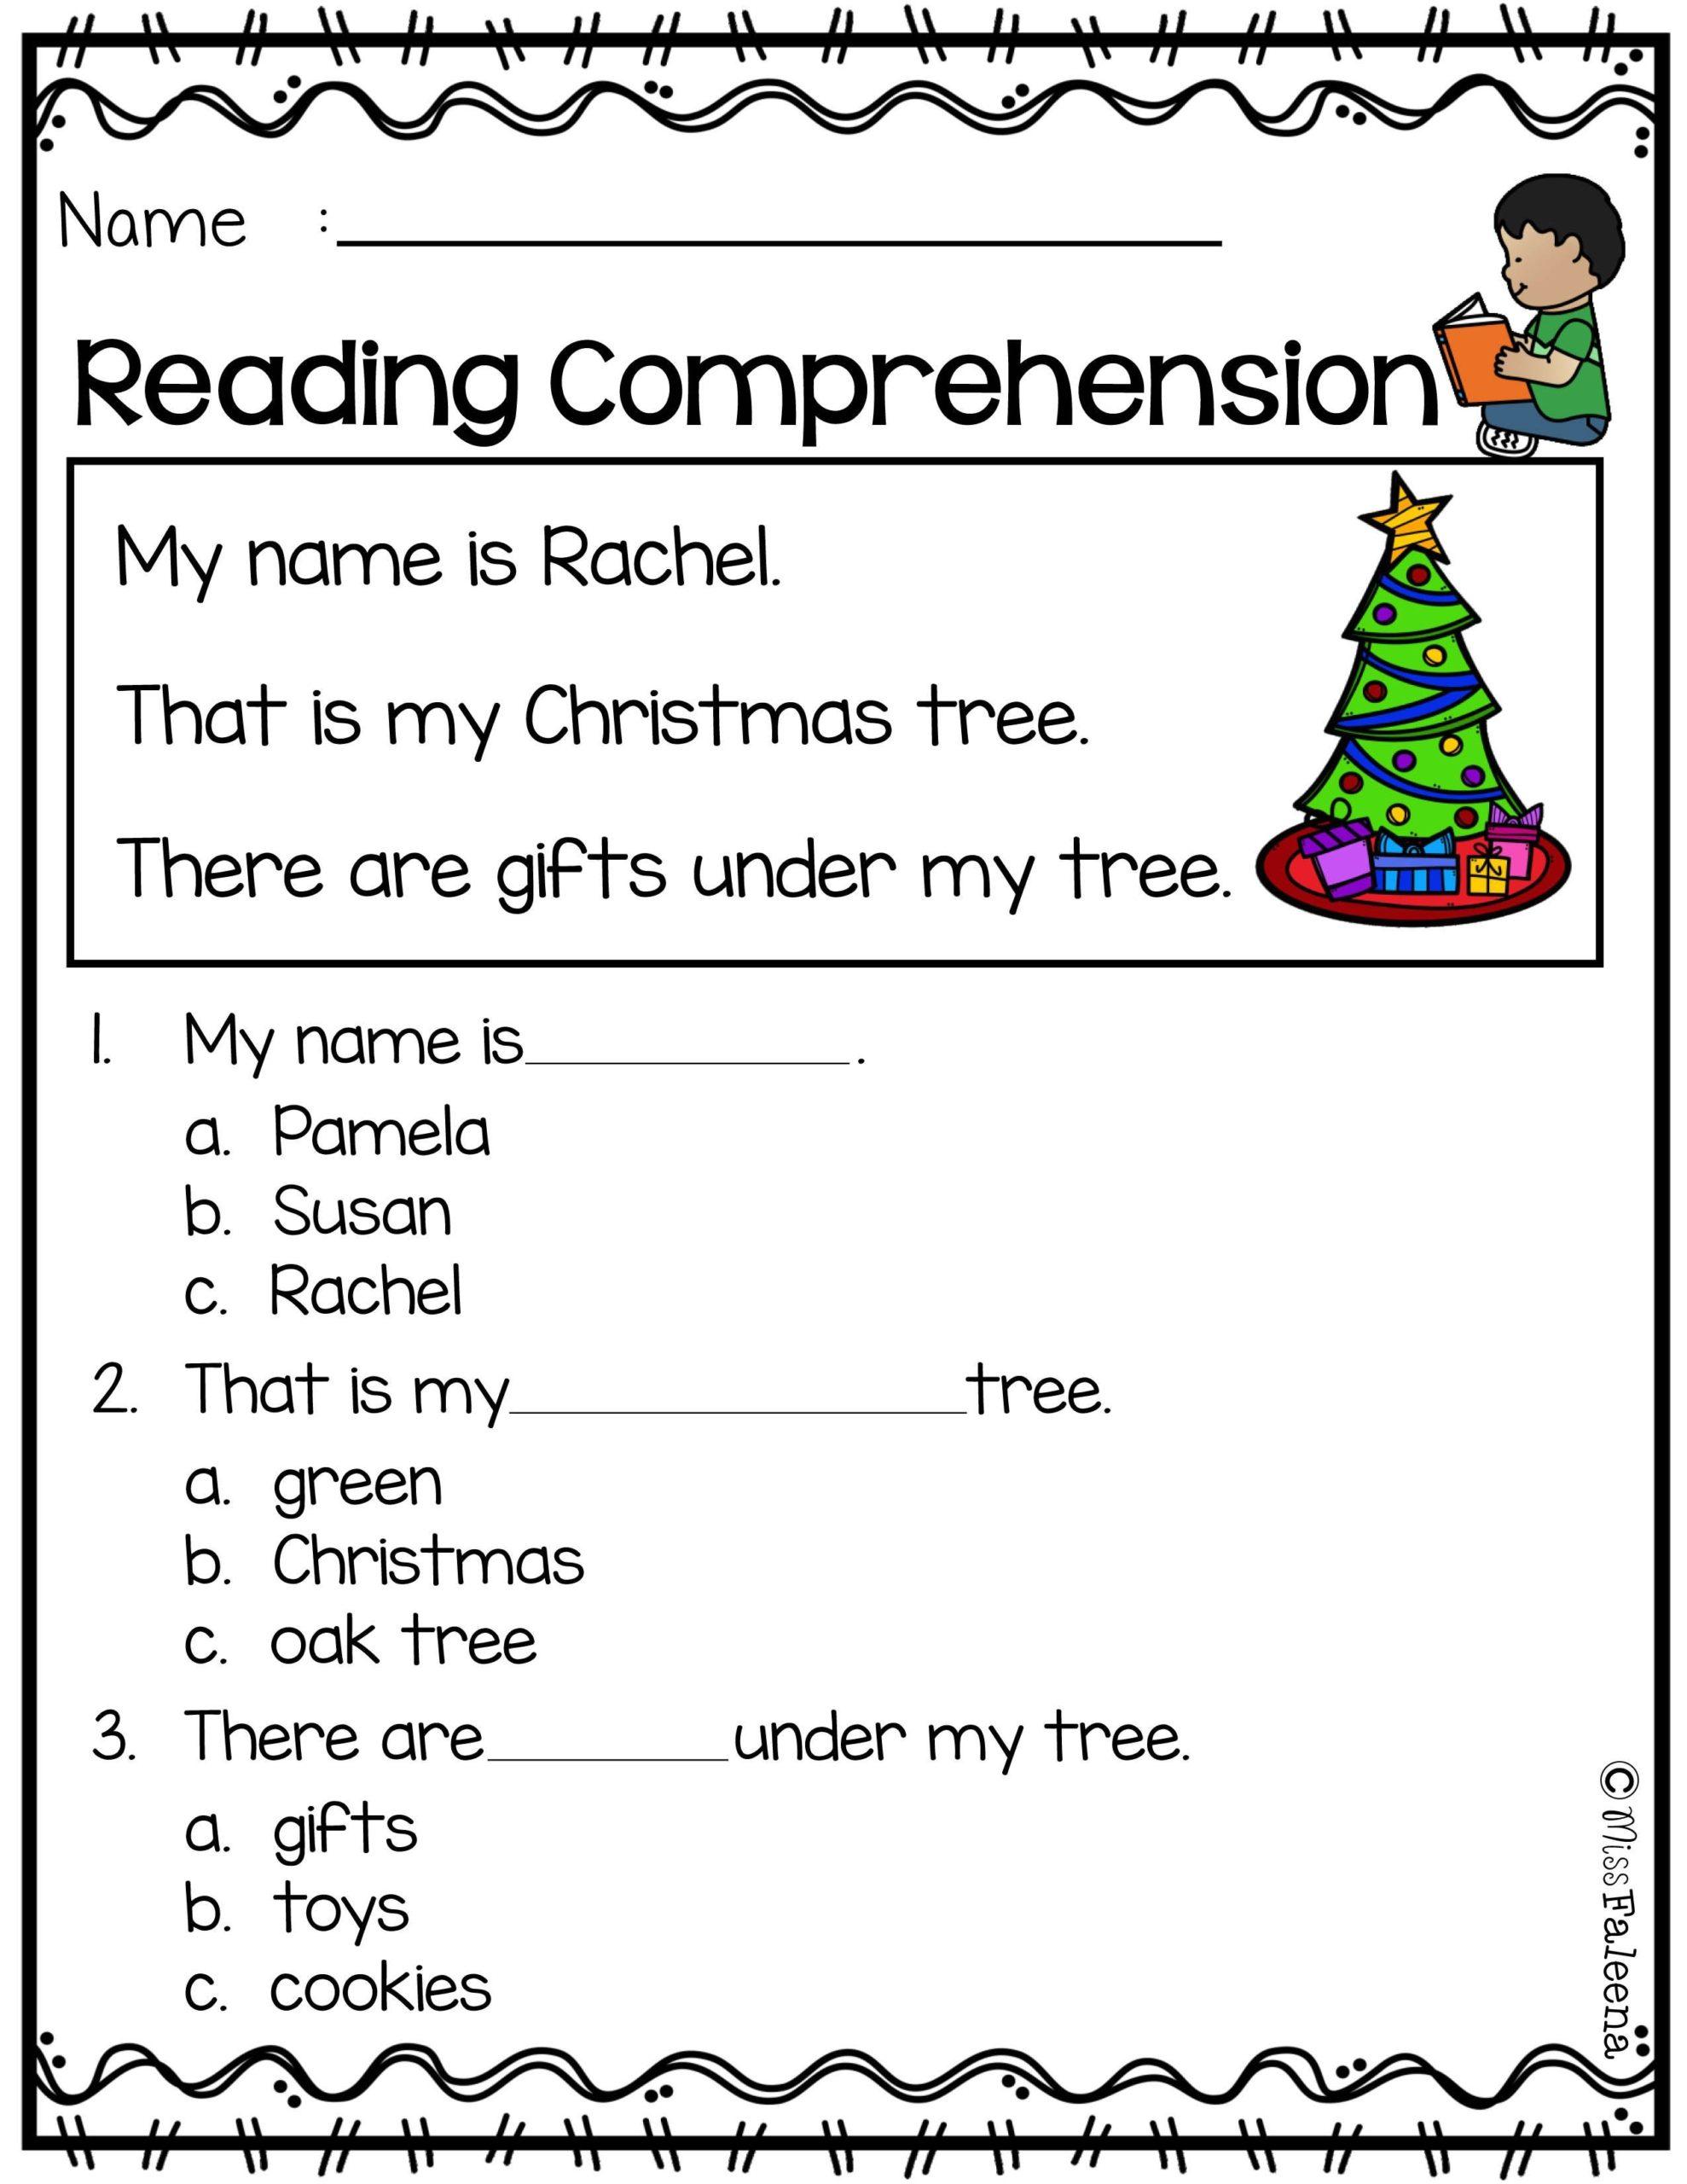 Math Worksheet : Third Grade Readingsion Worksheets 3Rd